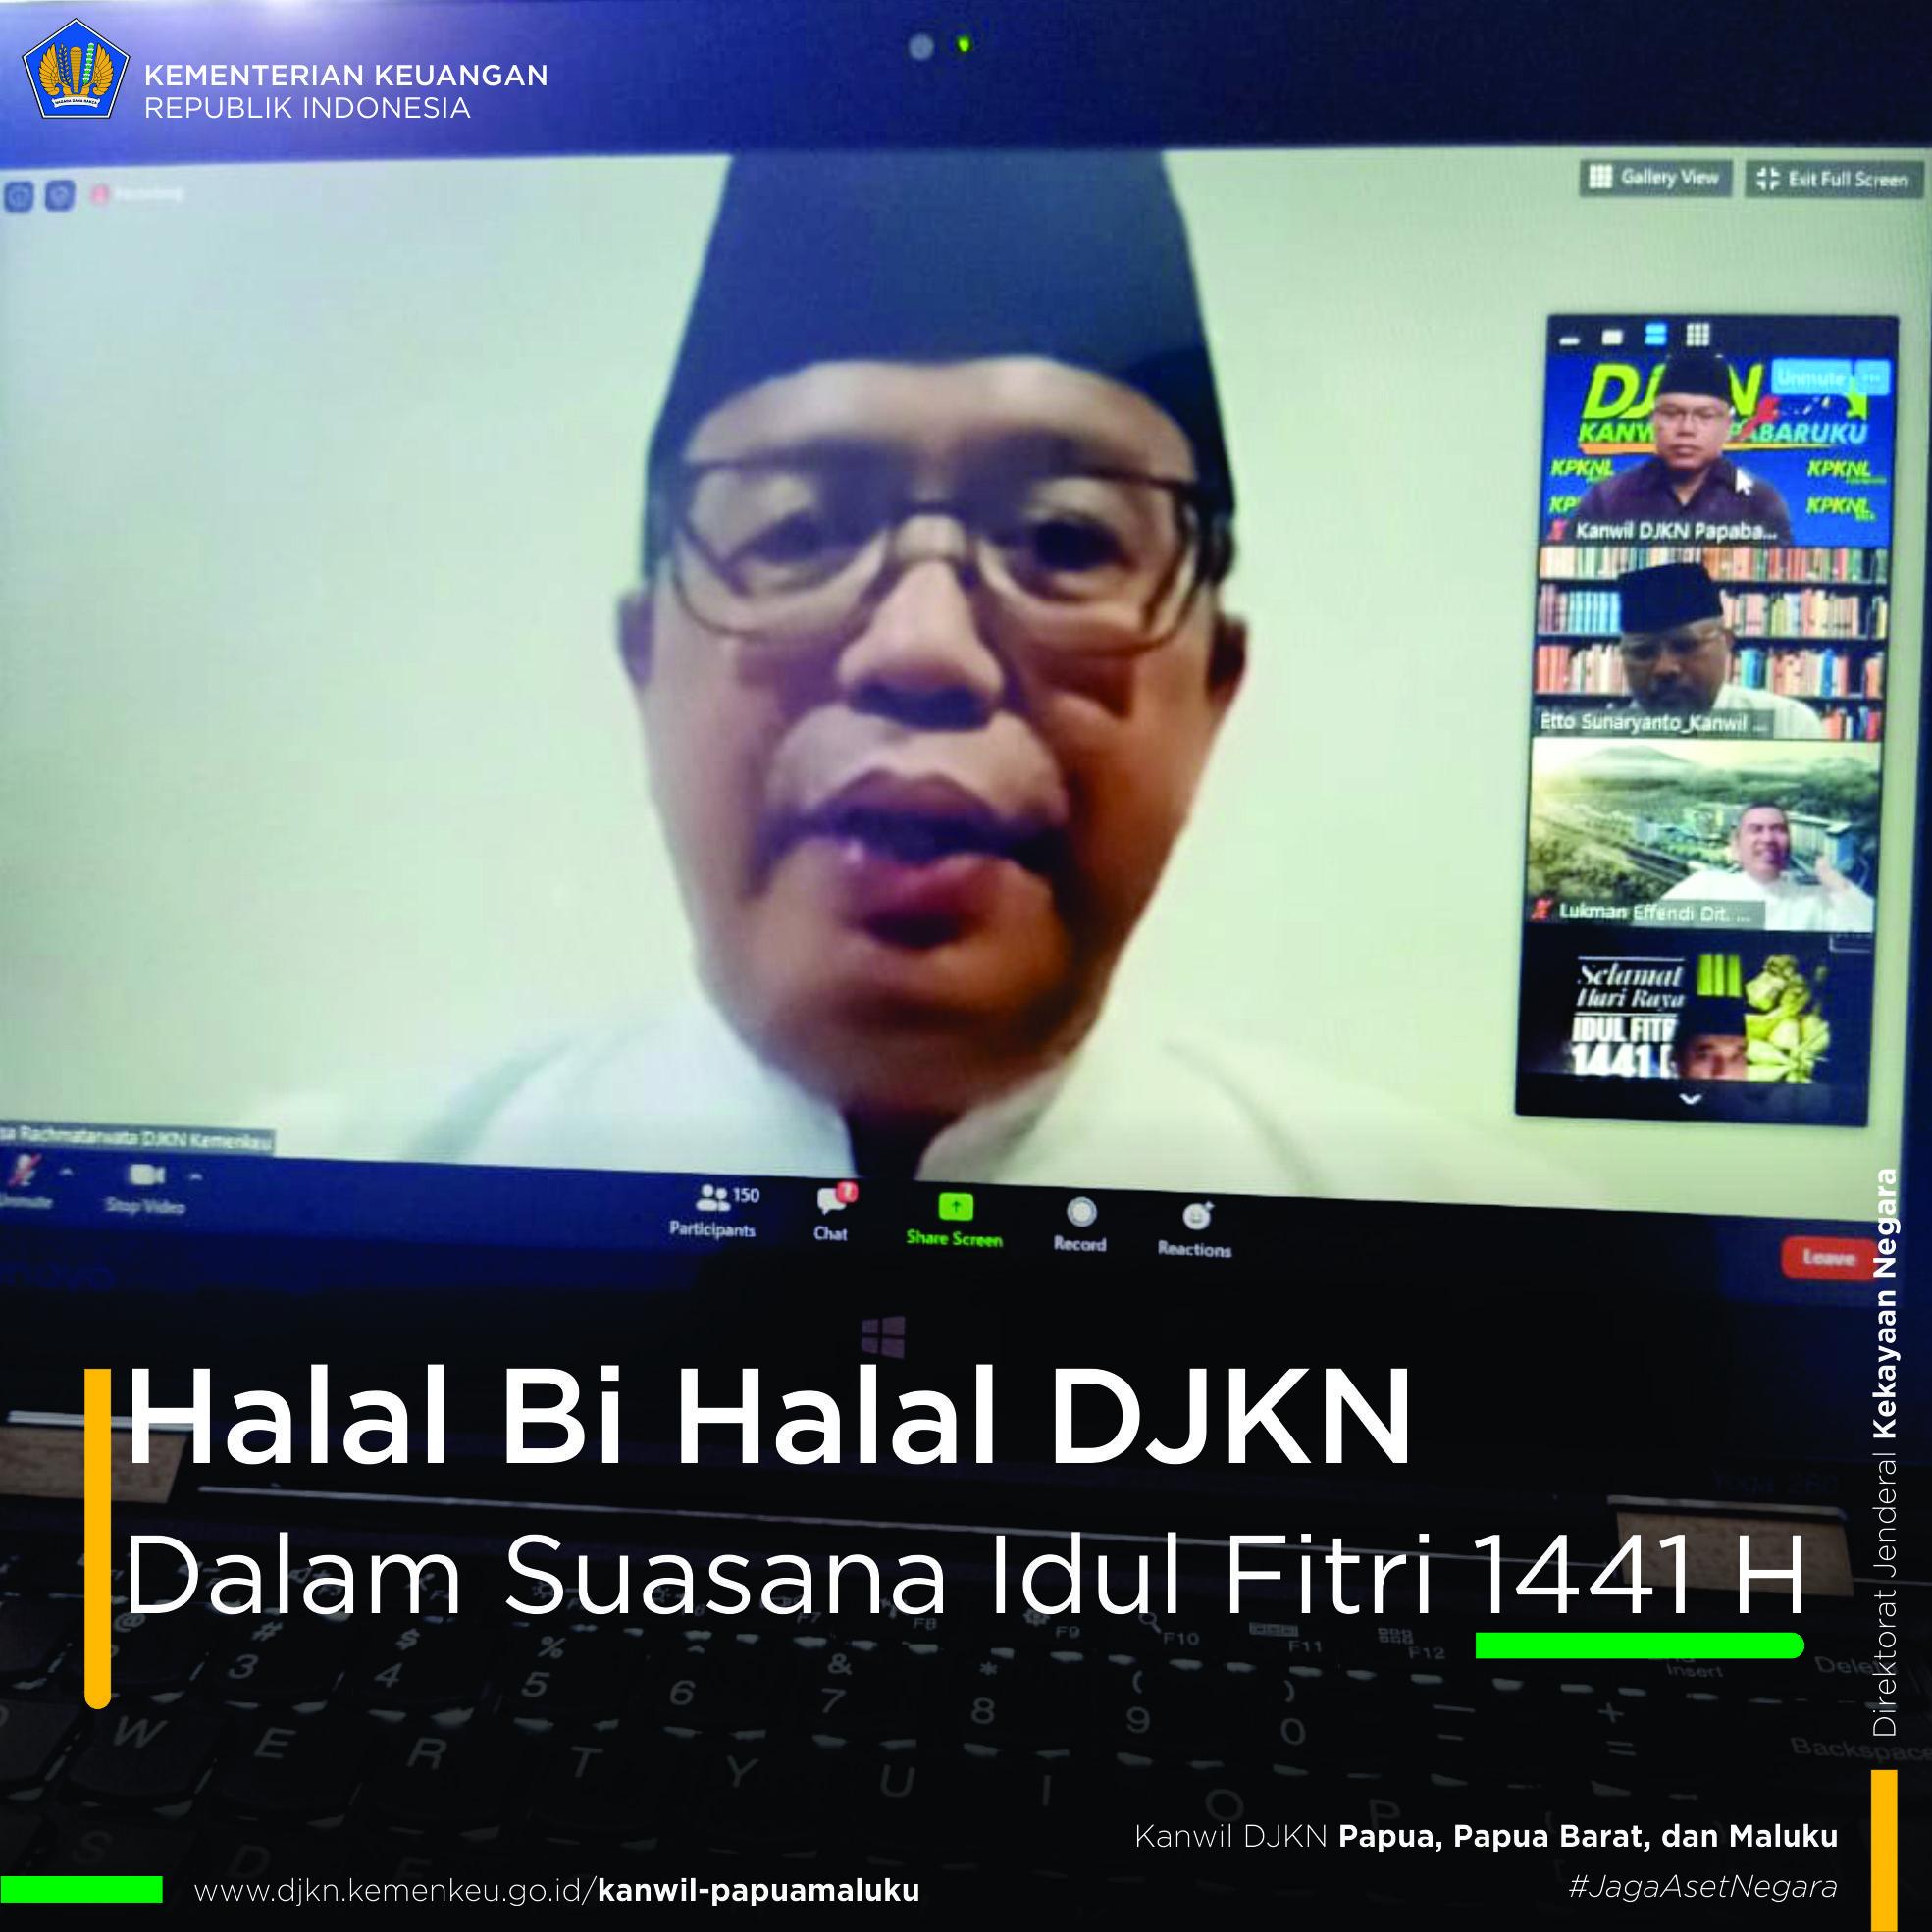 Halal Bi Halal DJKN Dalam Suasana Idul Fitri 1441 H